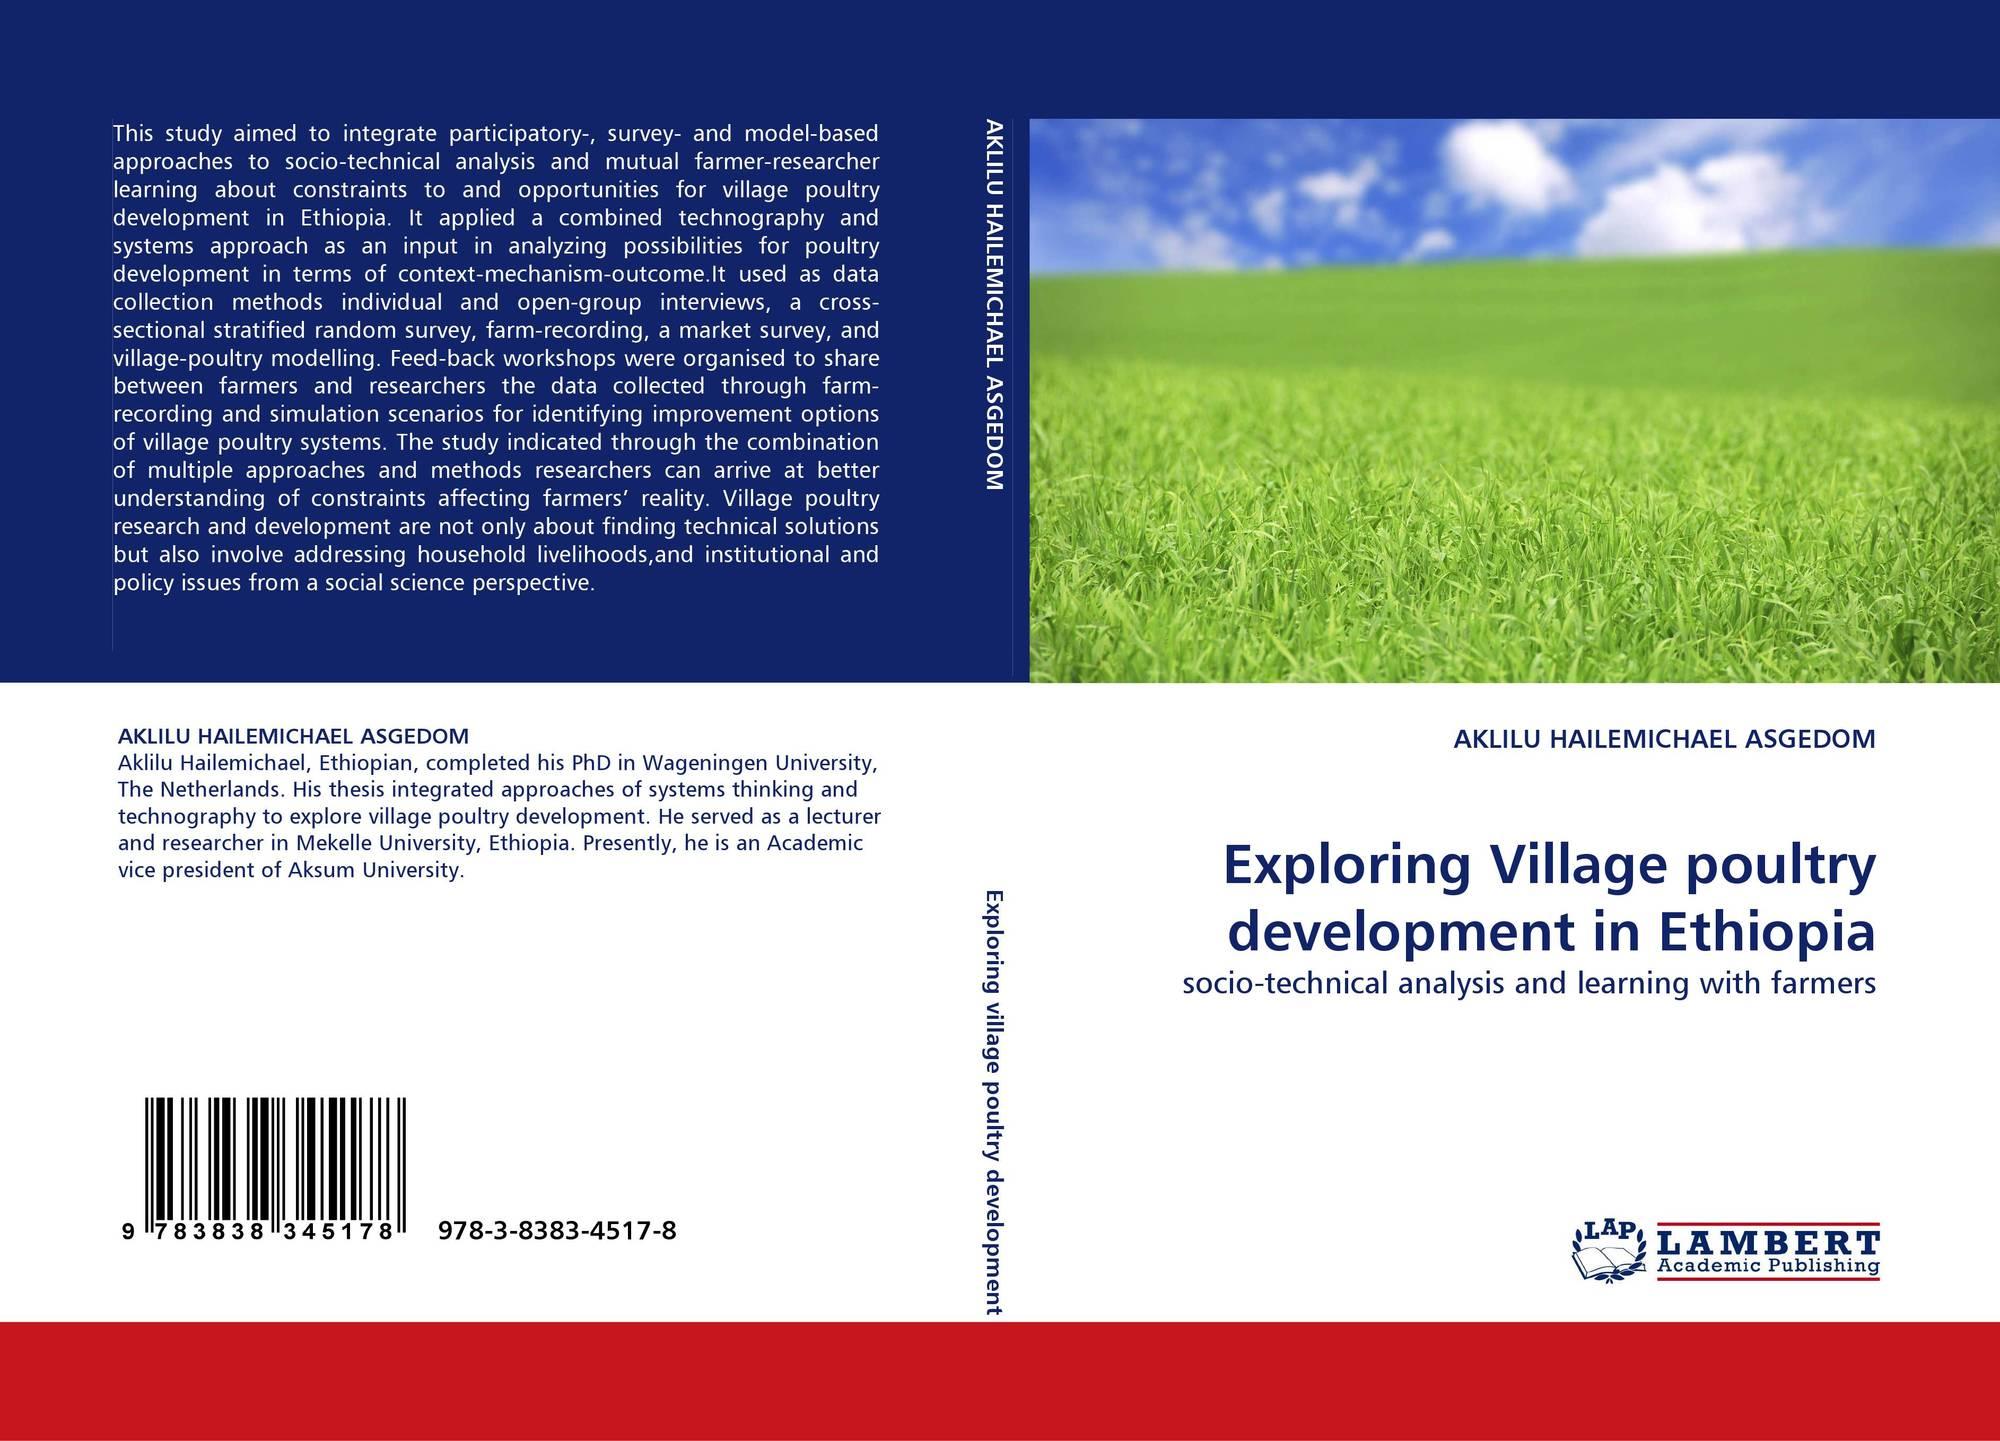 Exploring Village poultry development in Ethiopia, 978-3-8383-4517-8